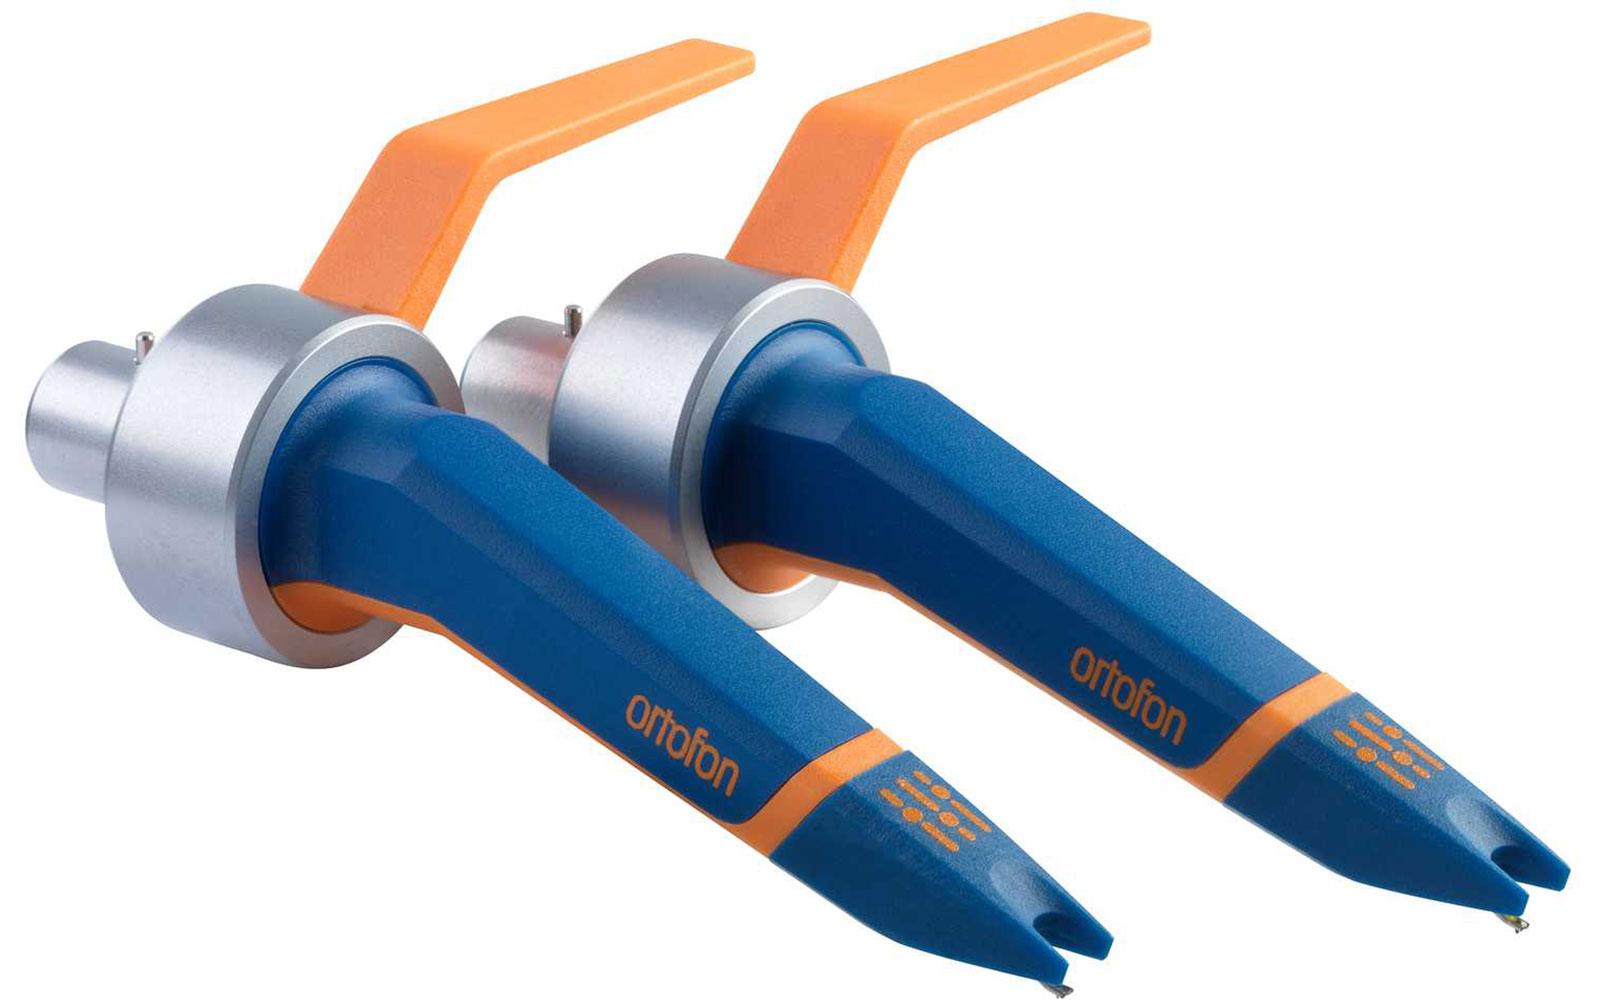 ortofon-concorde-dj-twin-set, 185.00 EUR @ music-and-more-store